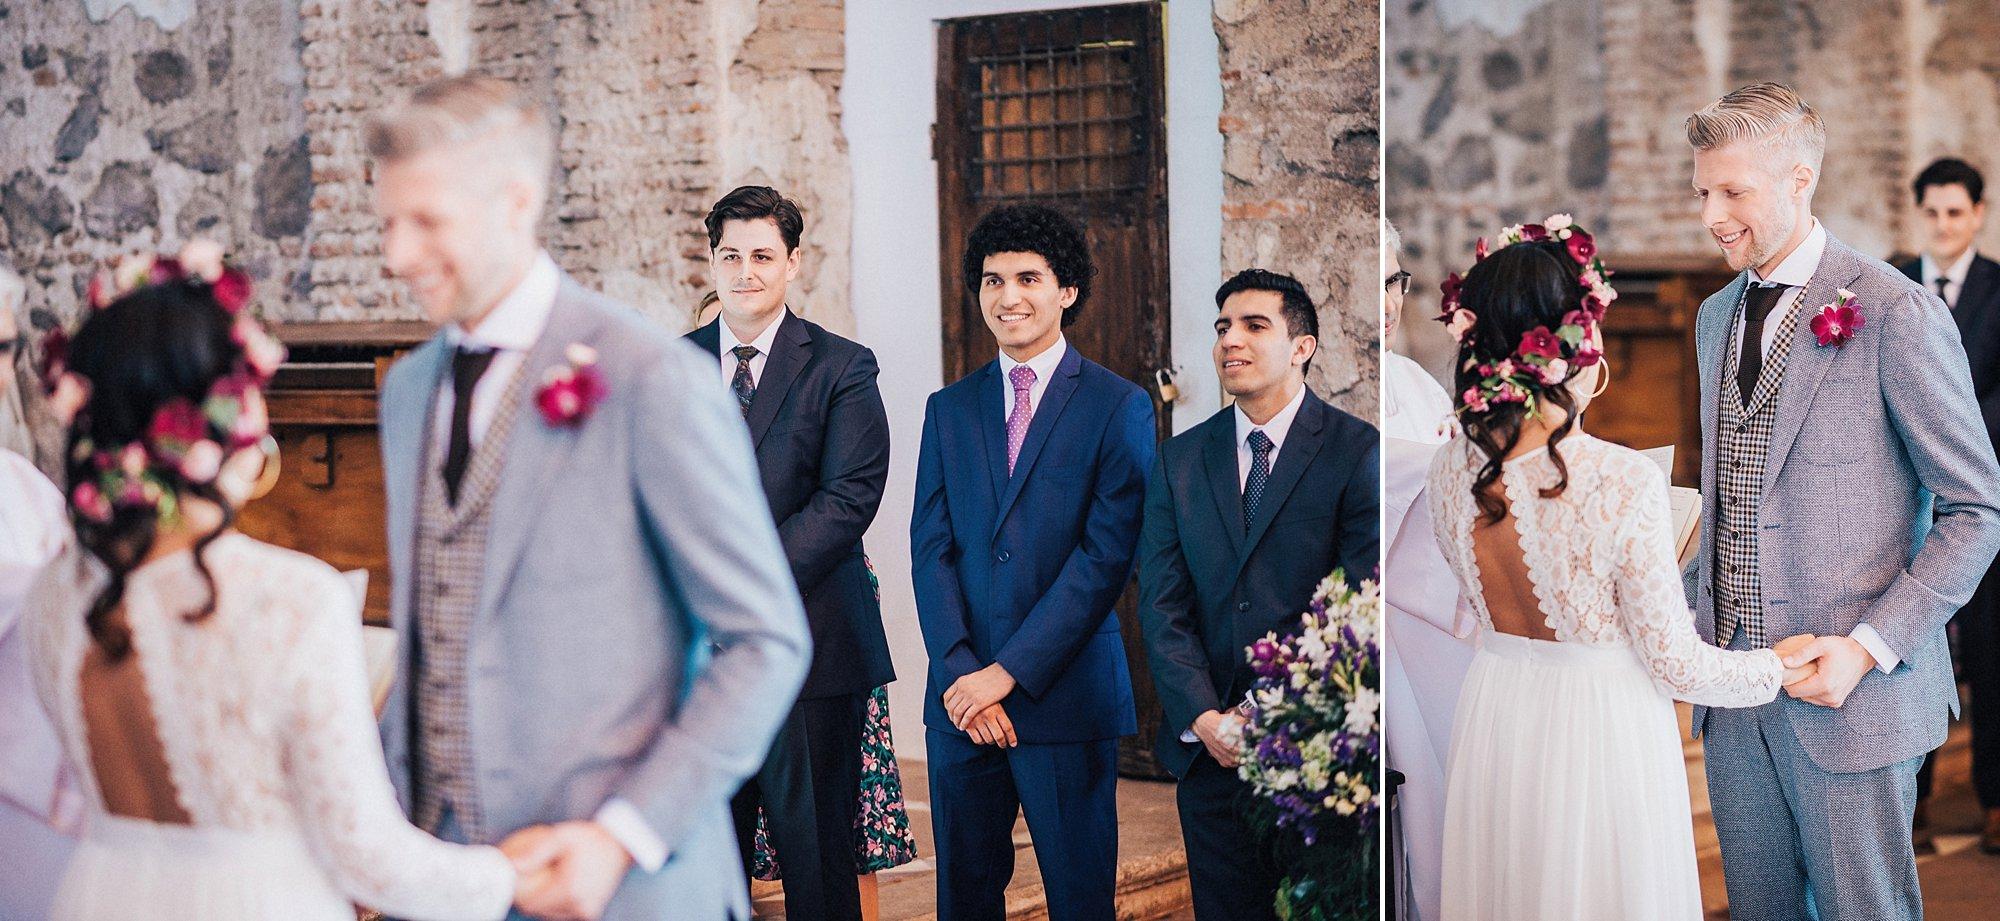 alex-yazmin-wedding-photographer-antigua-guatemala-079